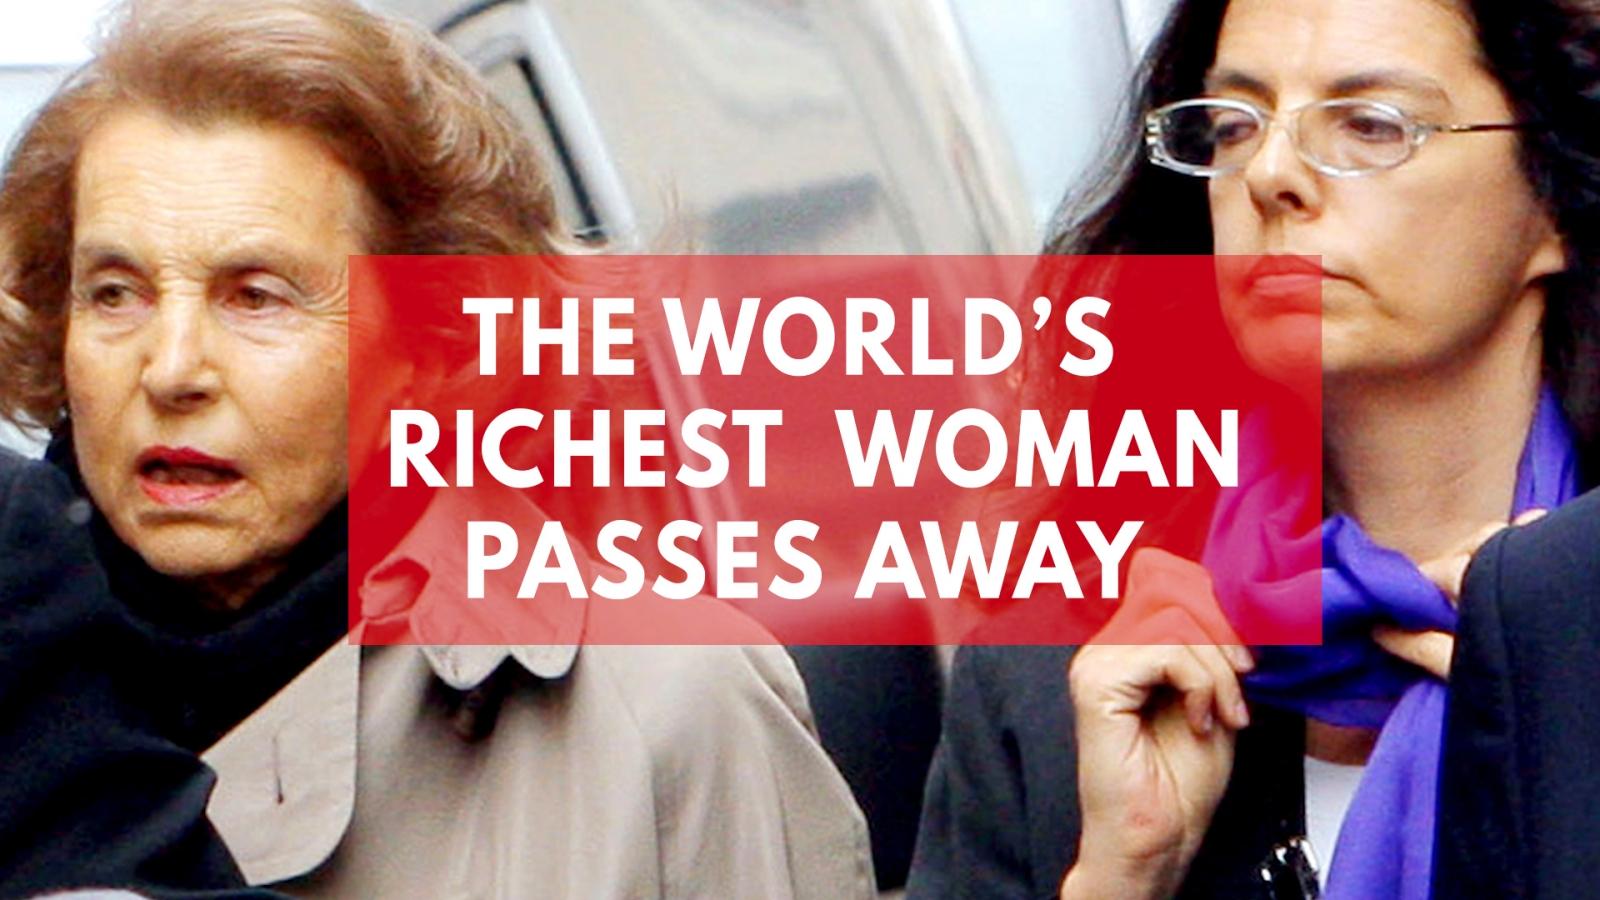 Liliane Bettencourt dies: The world's richest woman passes away